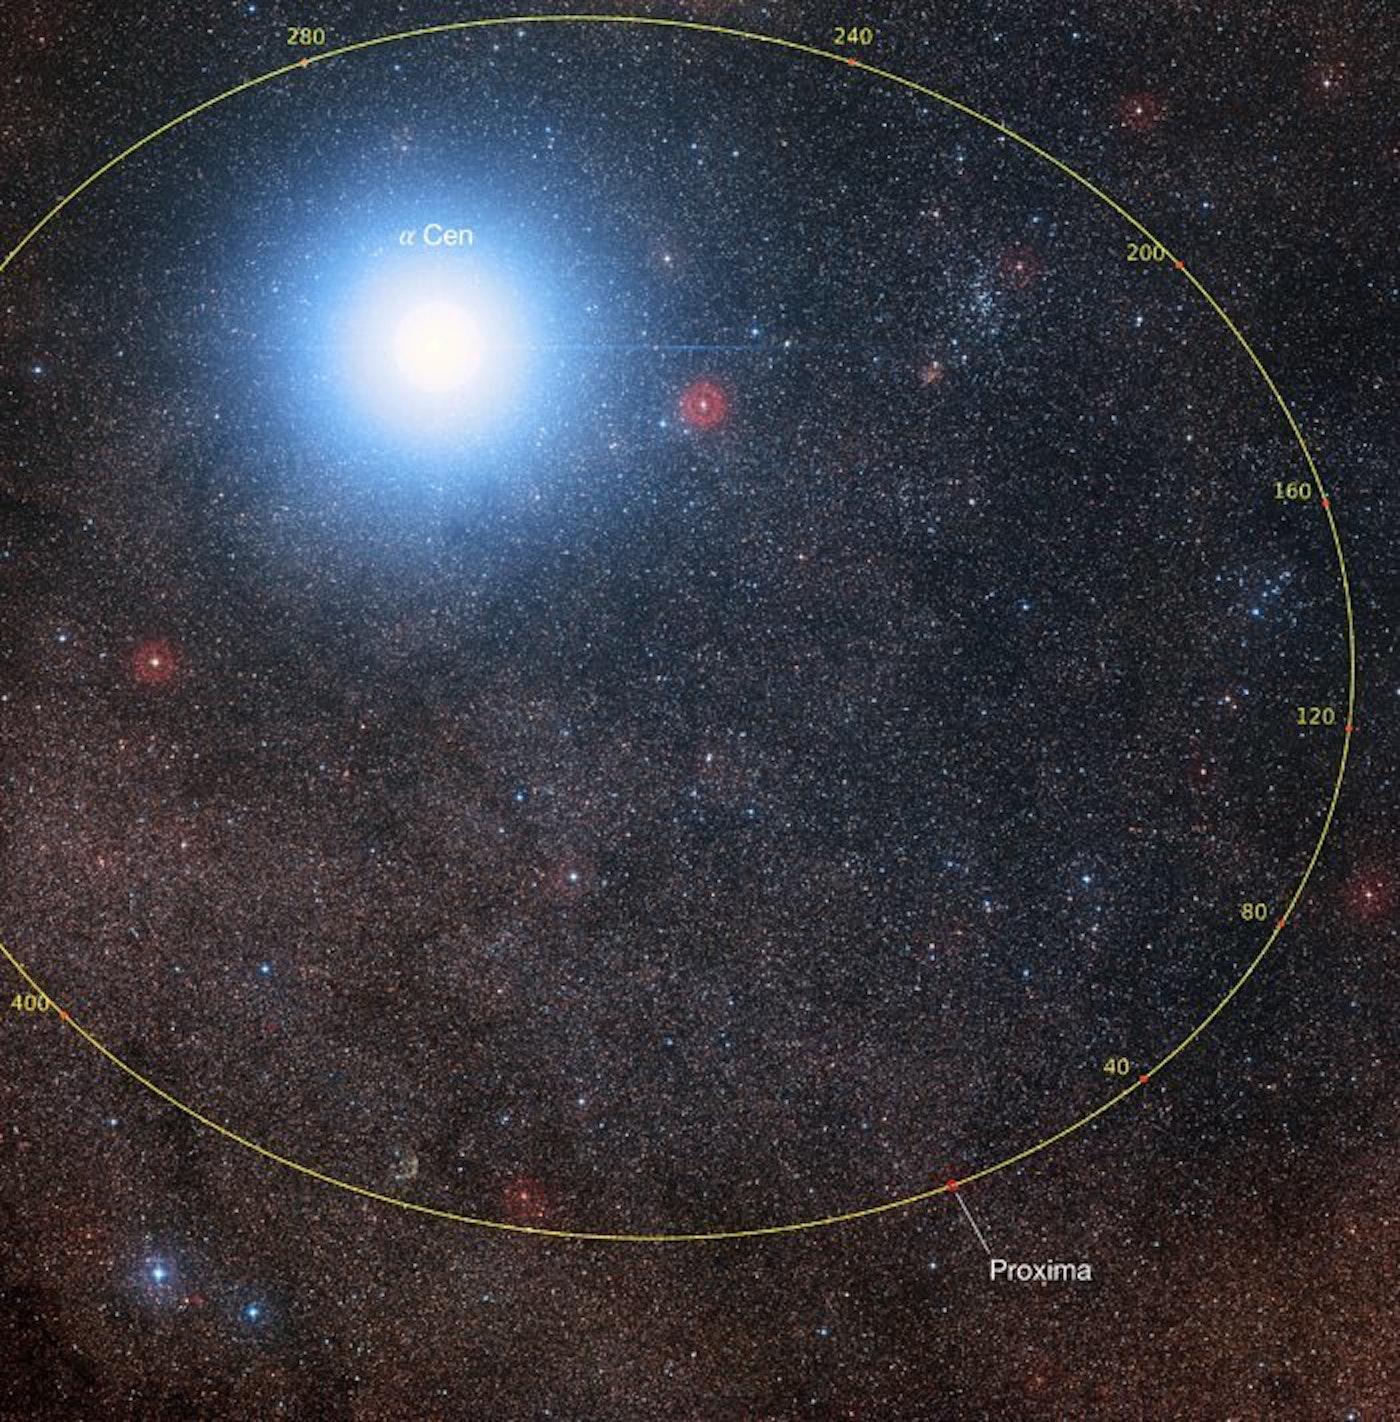 Nearest Potentially Habitable Alien Planet Has Three Suns